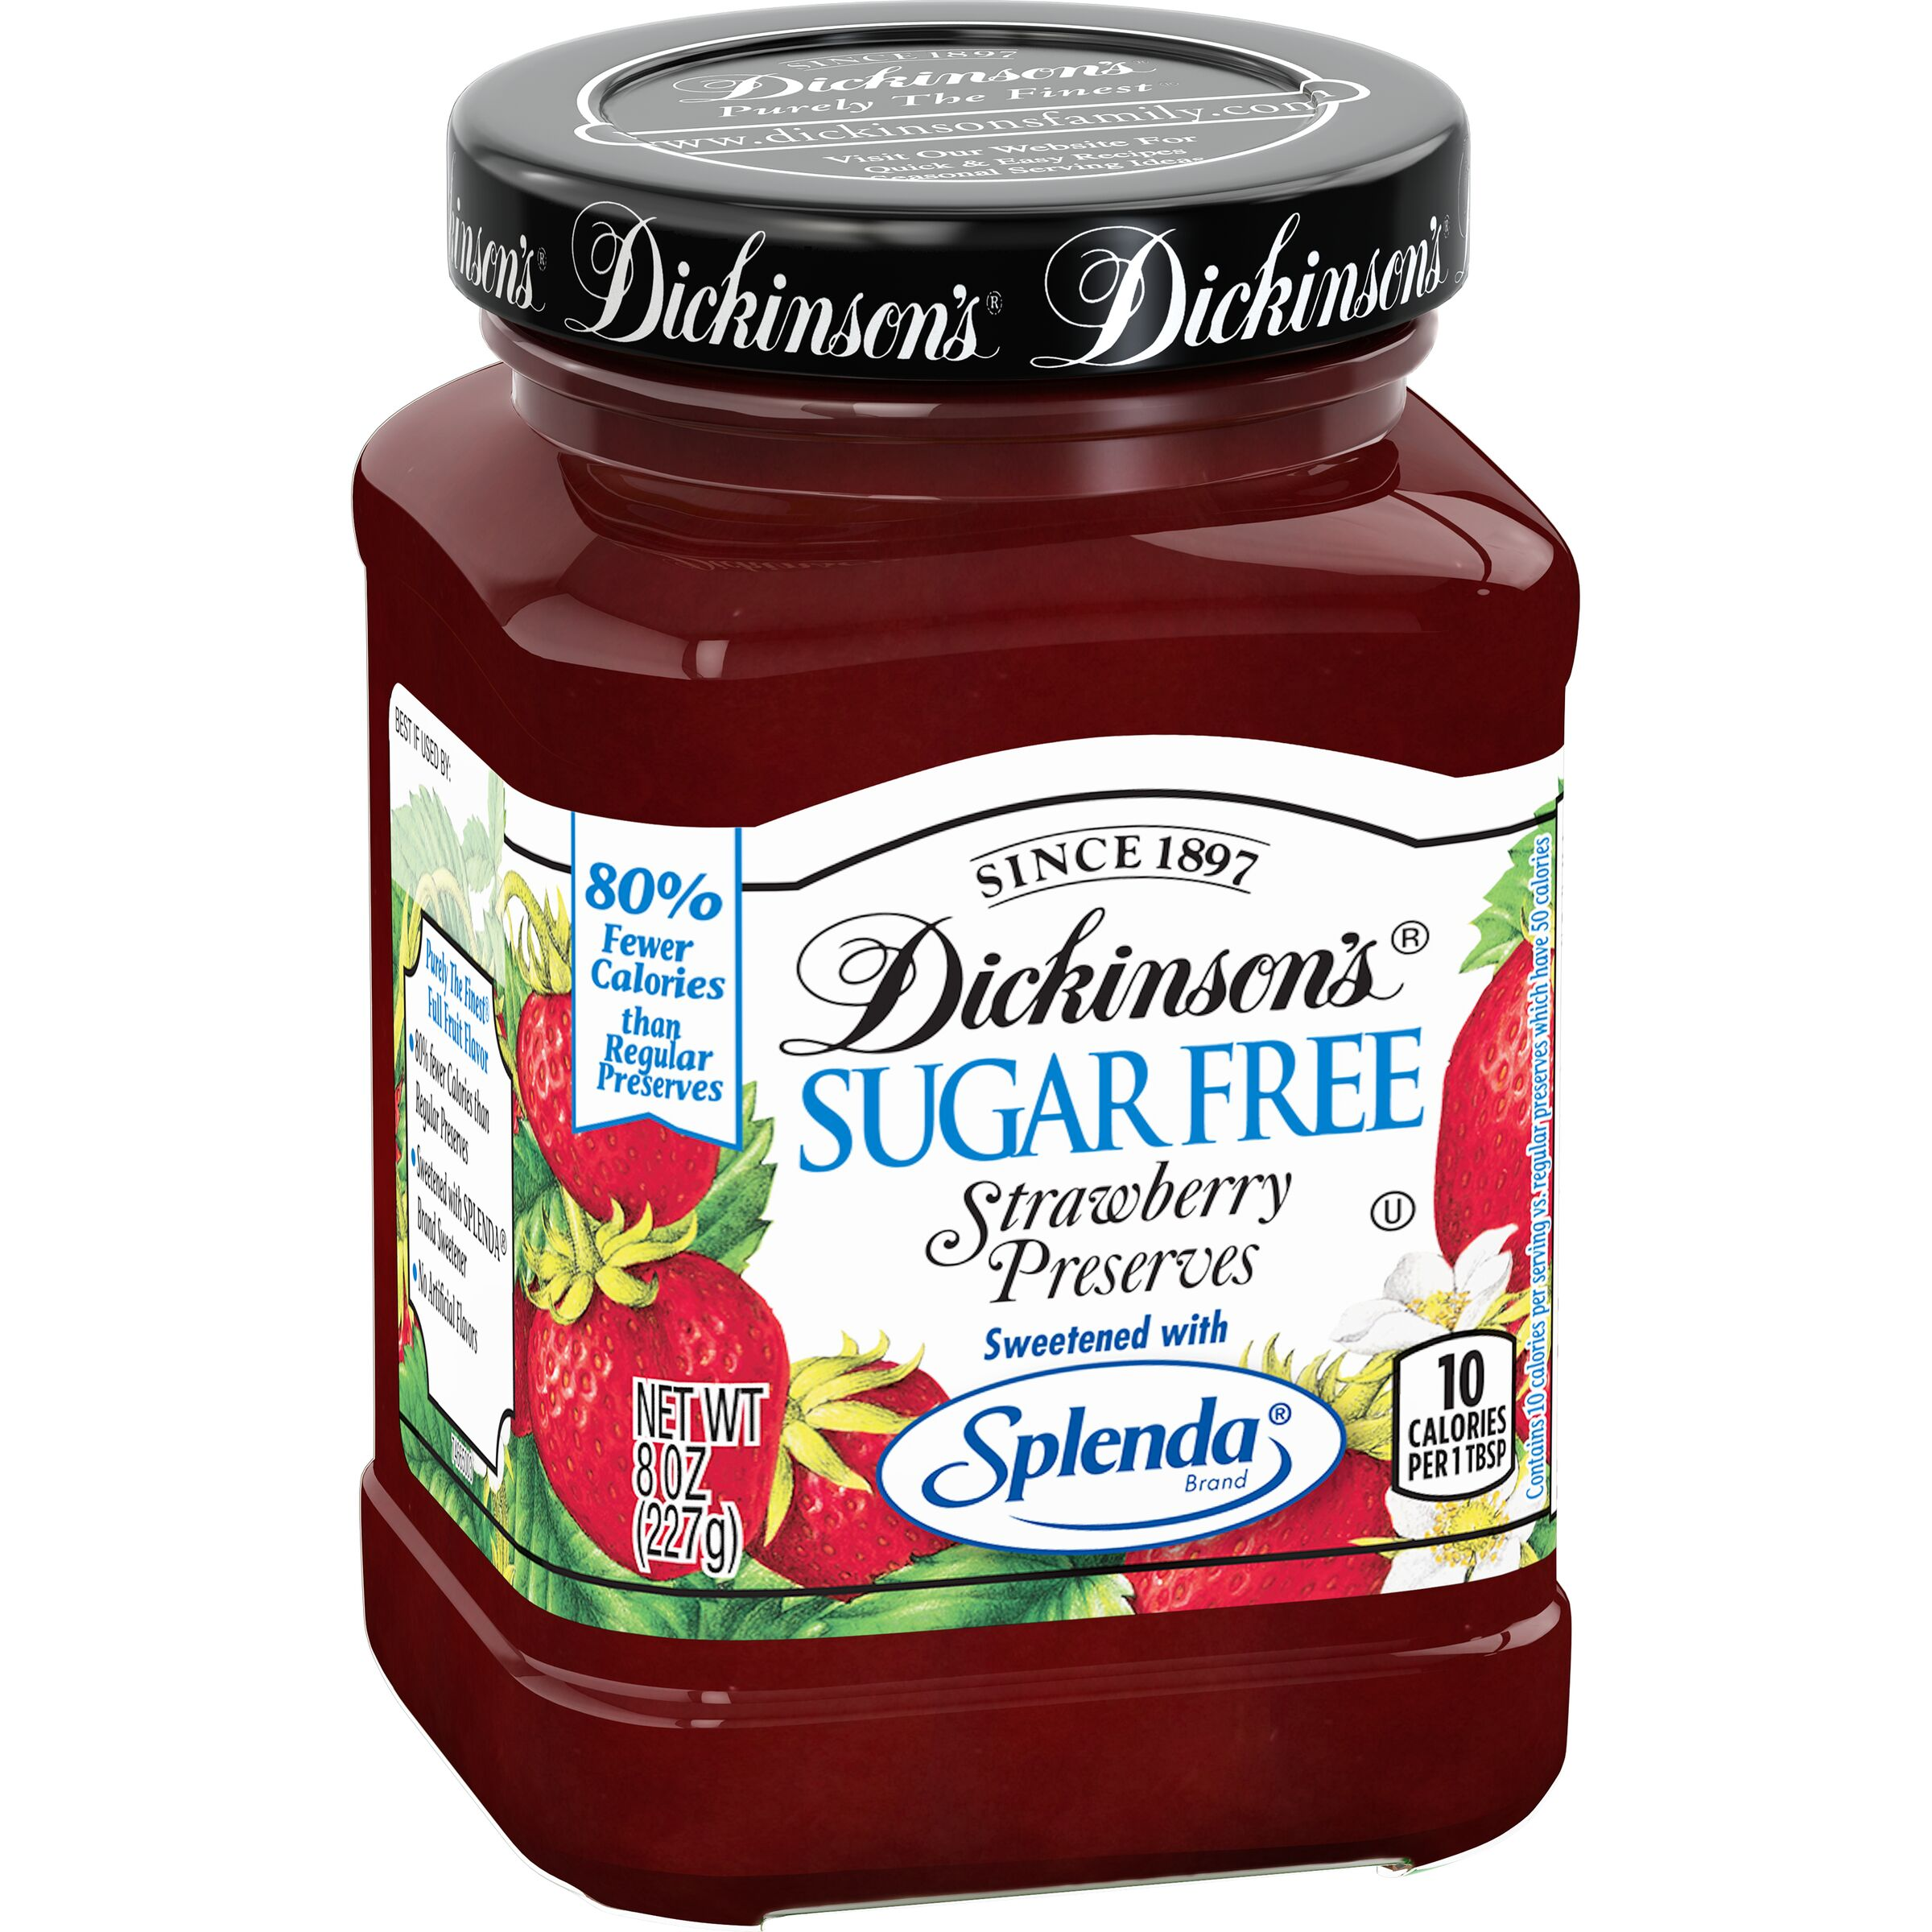 Dickinson's  Sugar Free Strawberry Preserves